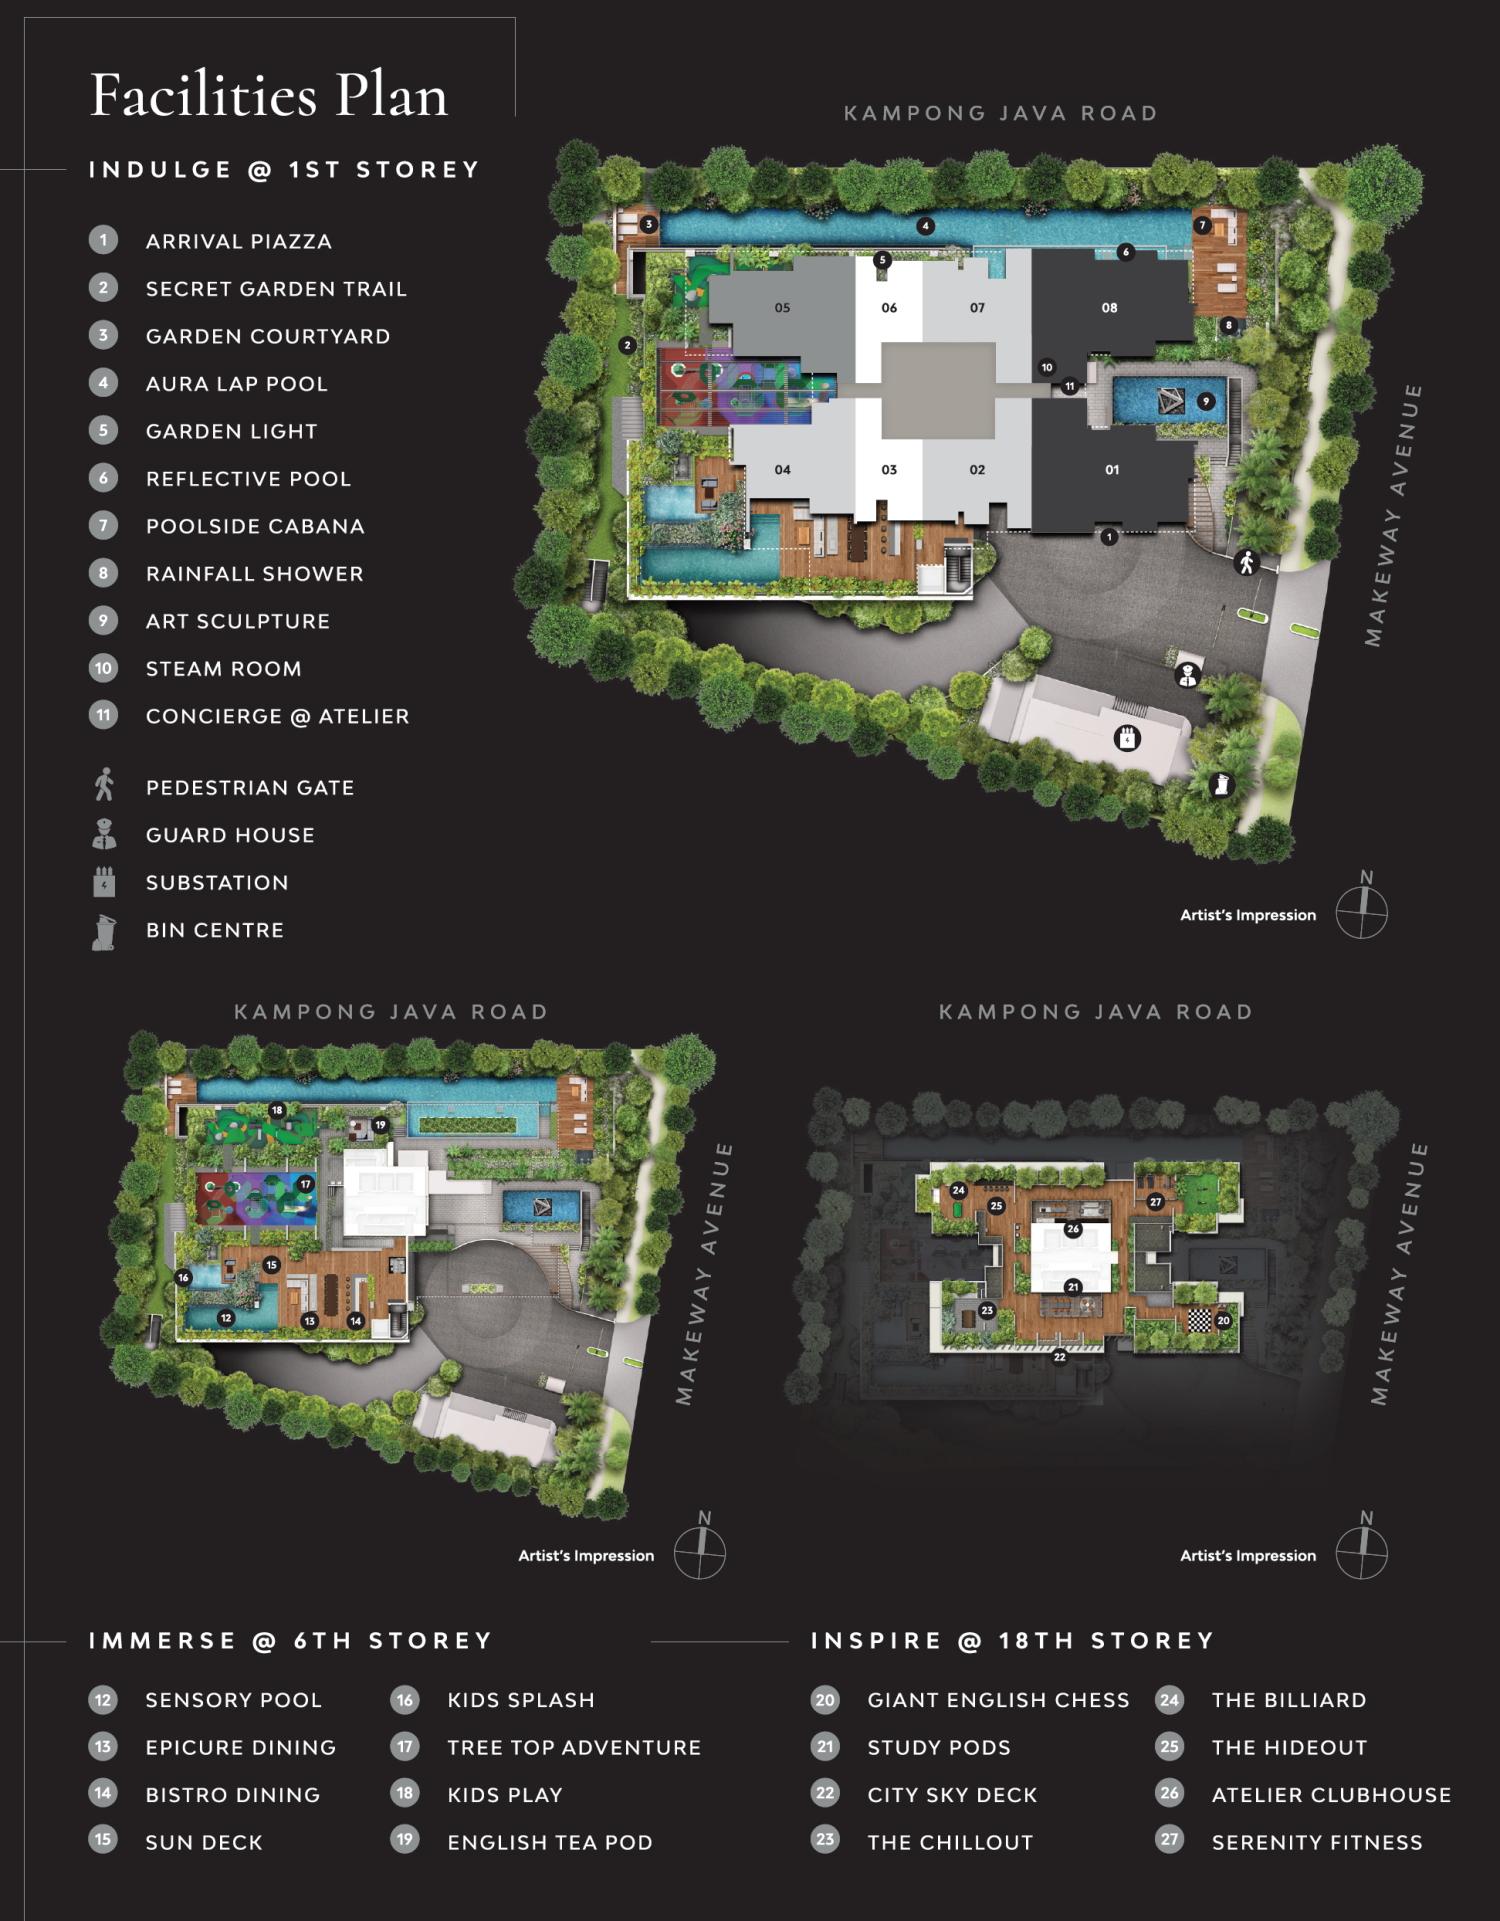 The Atelier site plan